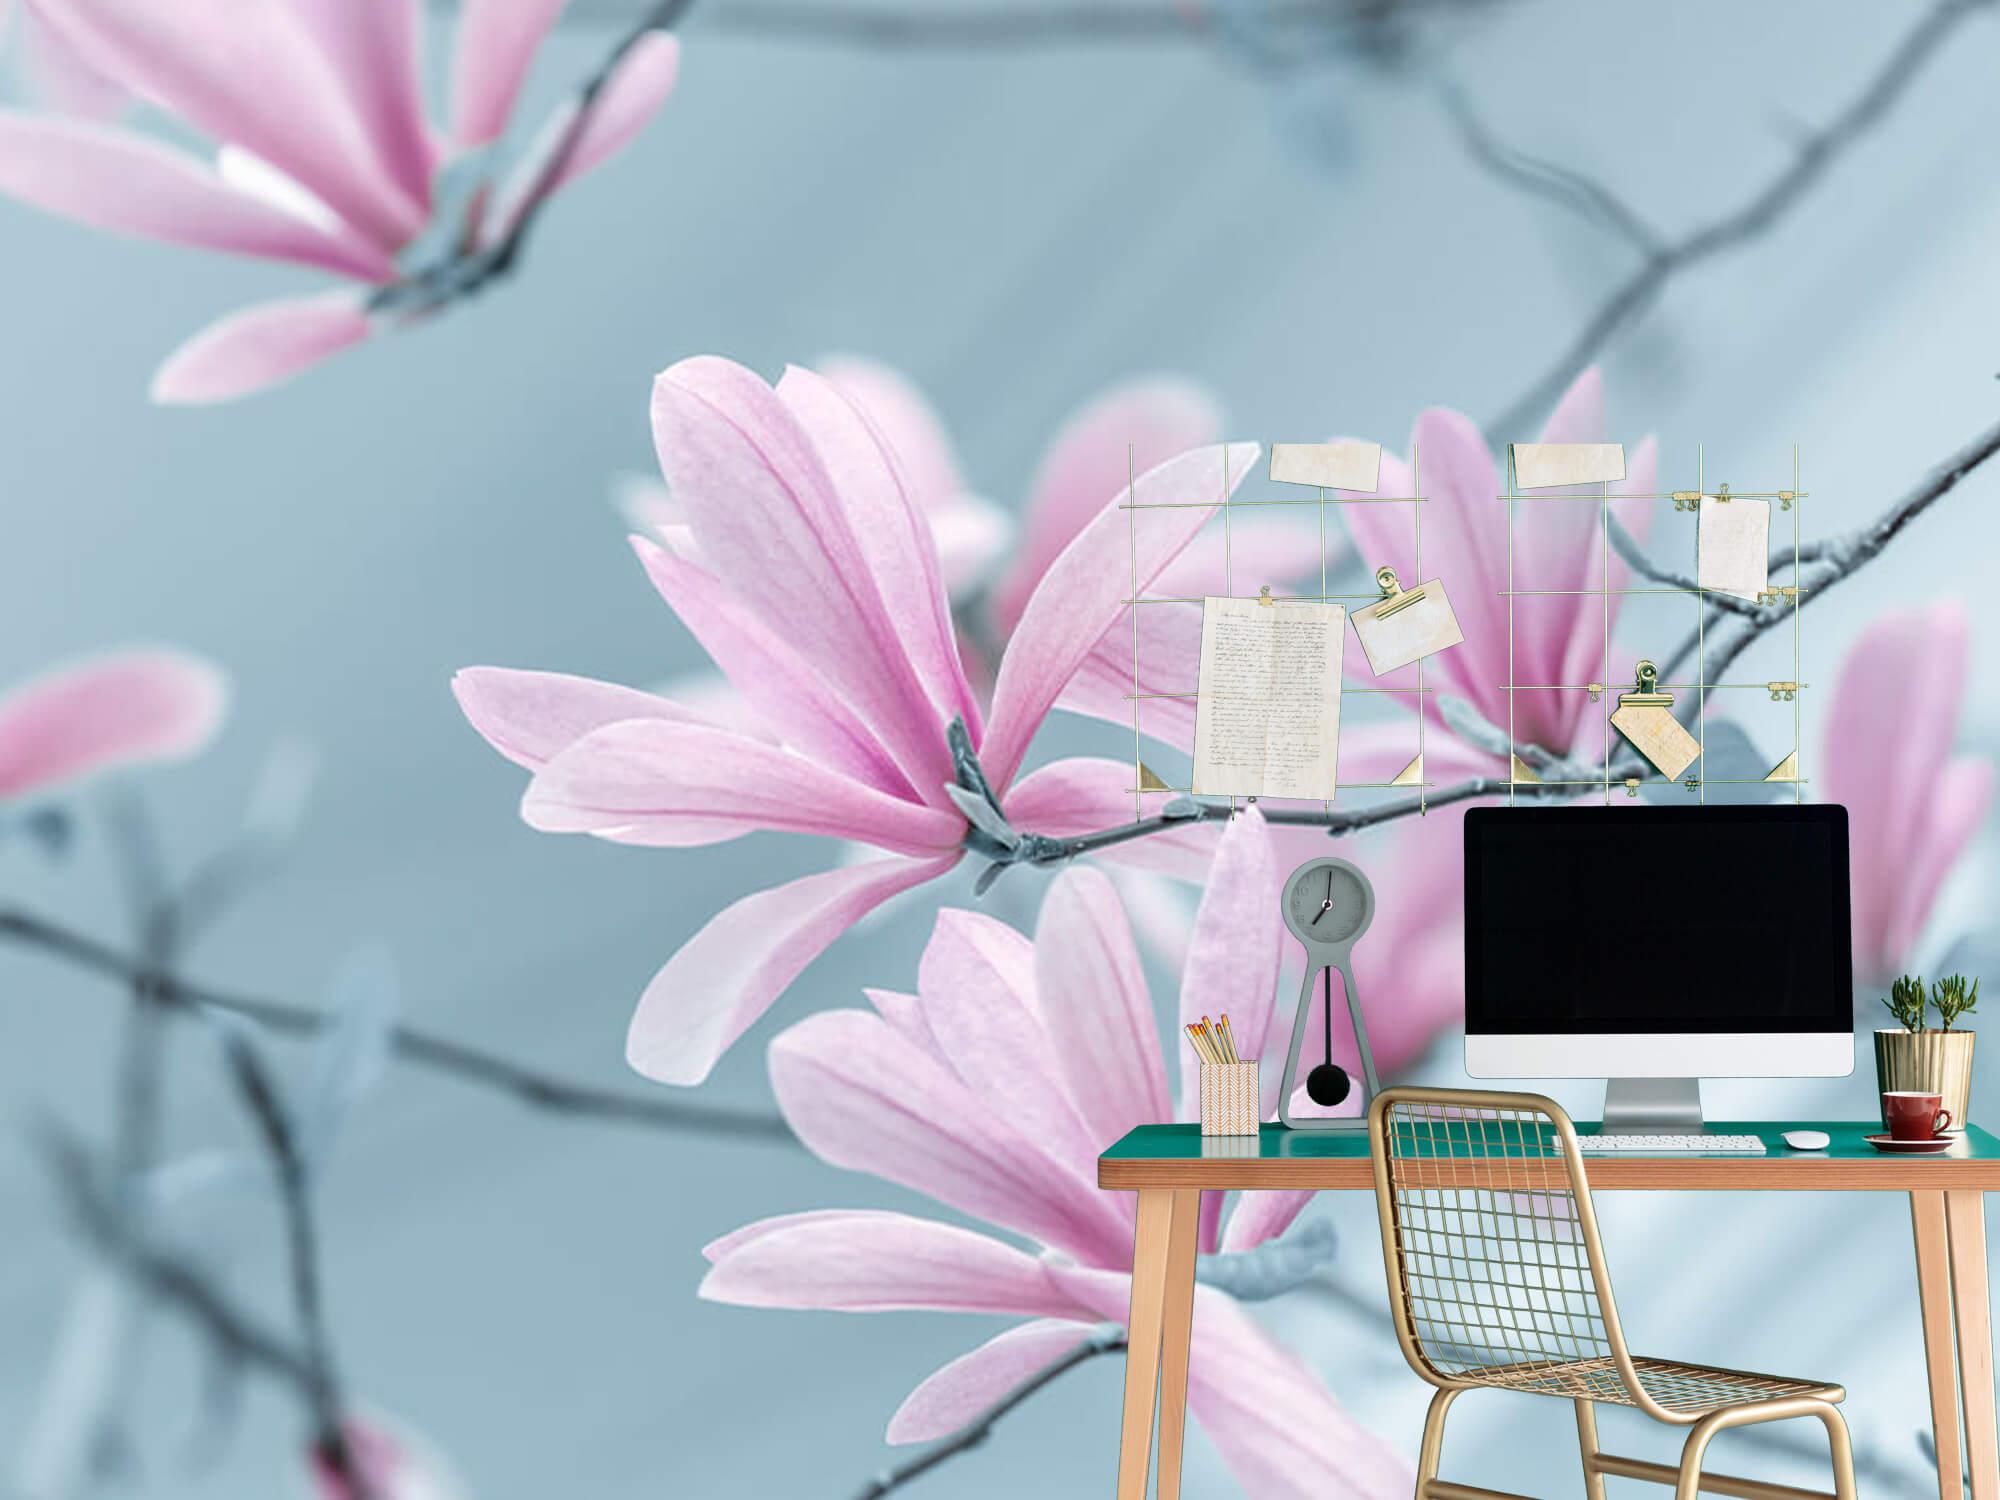 Magnolia bloemen 4